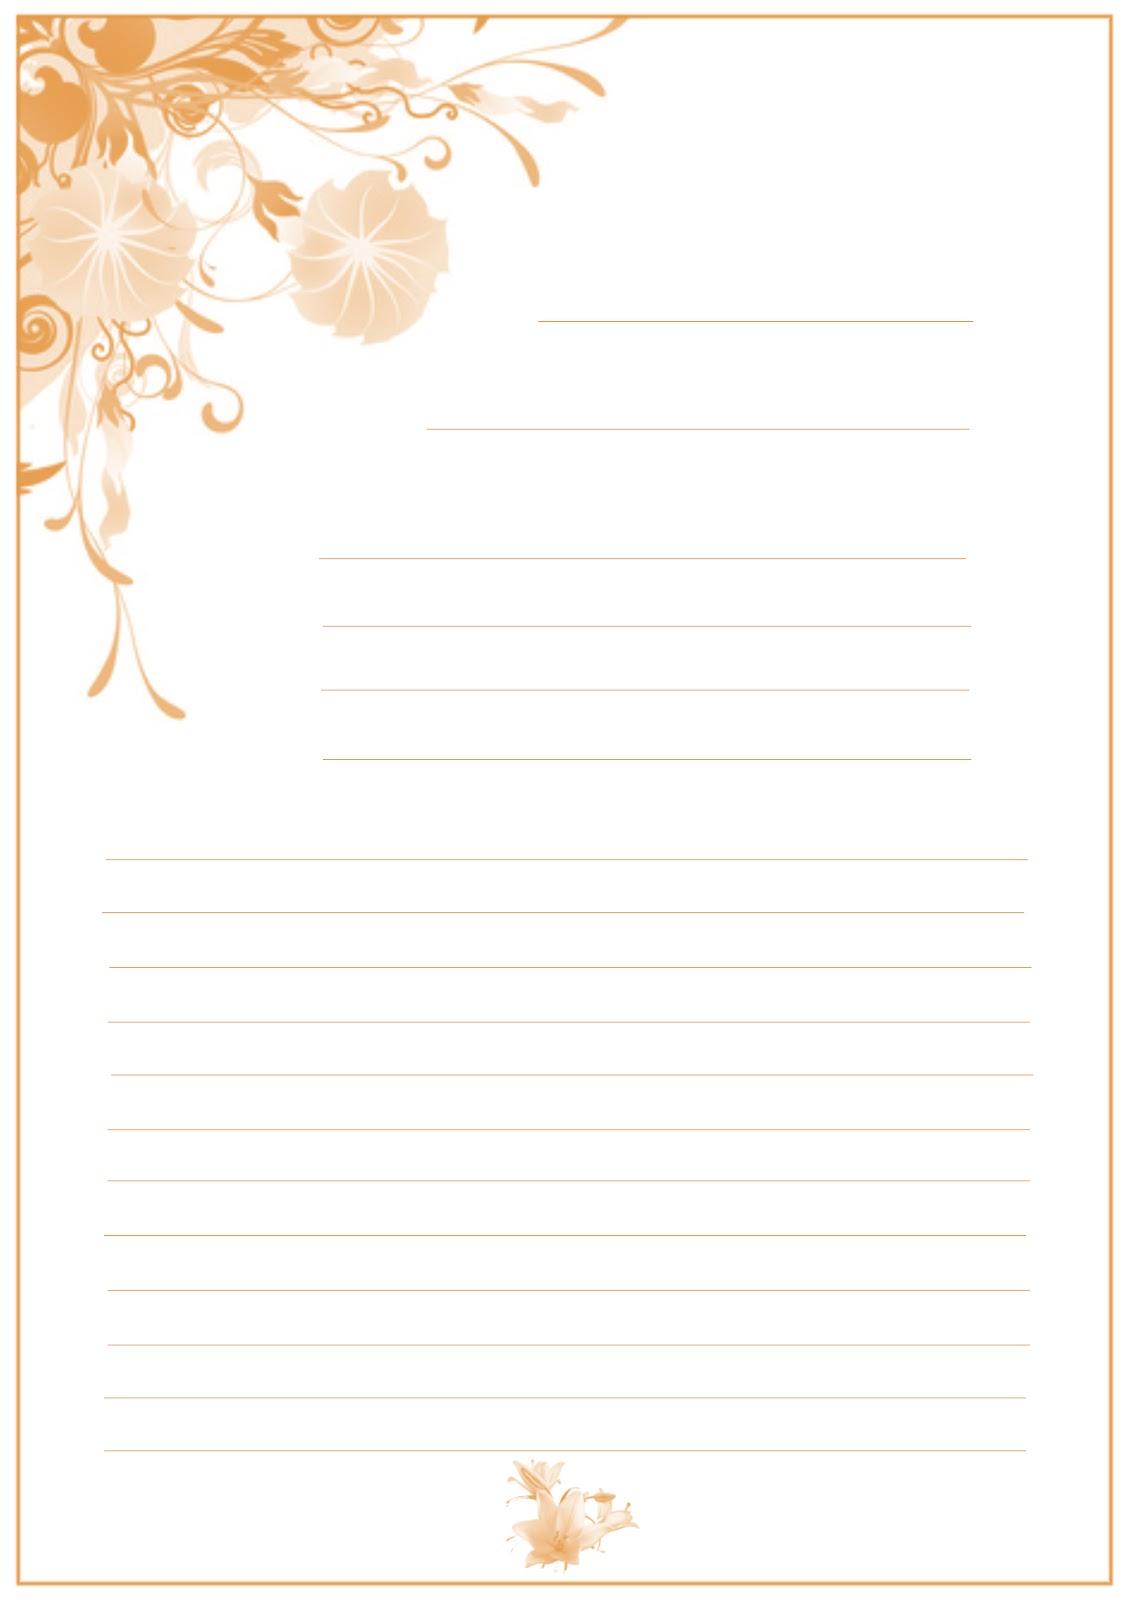 Узорчатые Рамки Для Оформления Текста А4